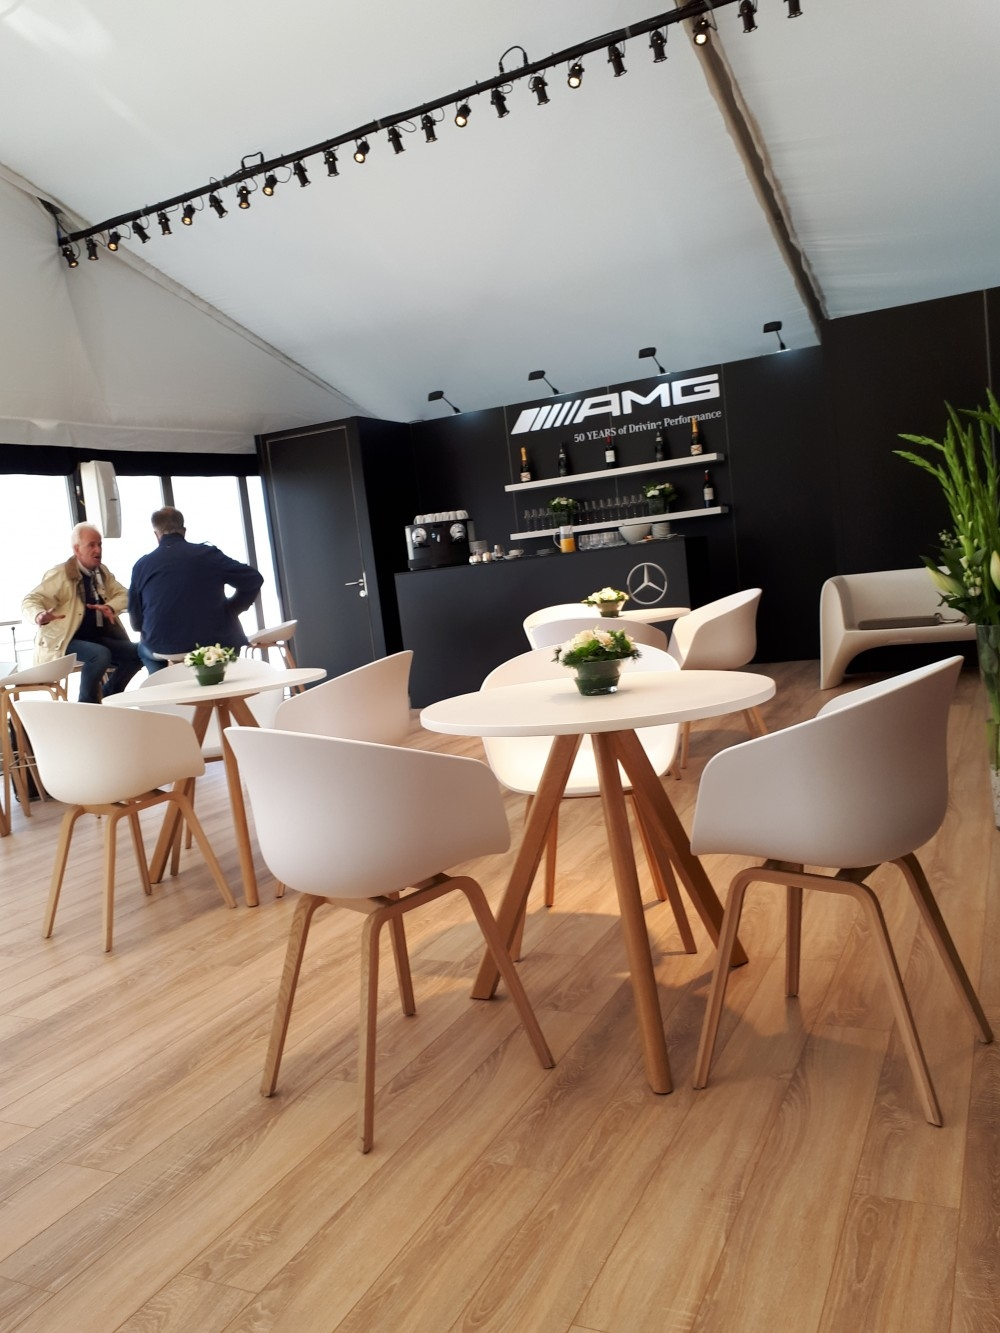 zoute grand prix-conceptexpo-mercedes AMG- pop up store- construction stand - aménagement de stand (8)